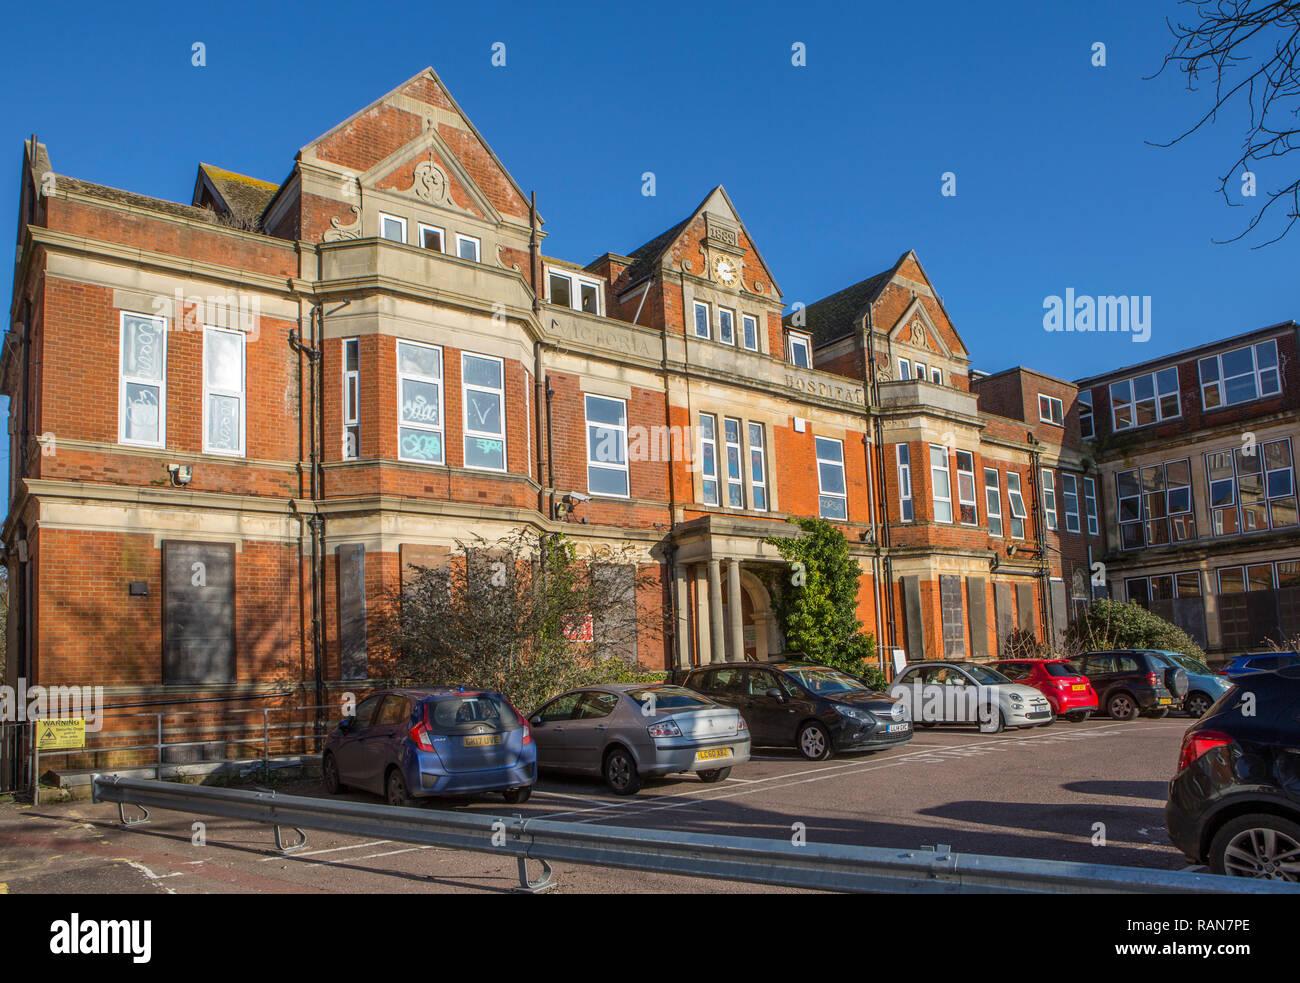 The old Royal Victoria Hospital, Folkestone, Kent, UK. Stock Photo